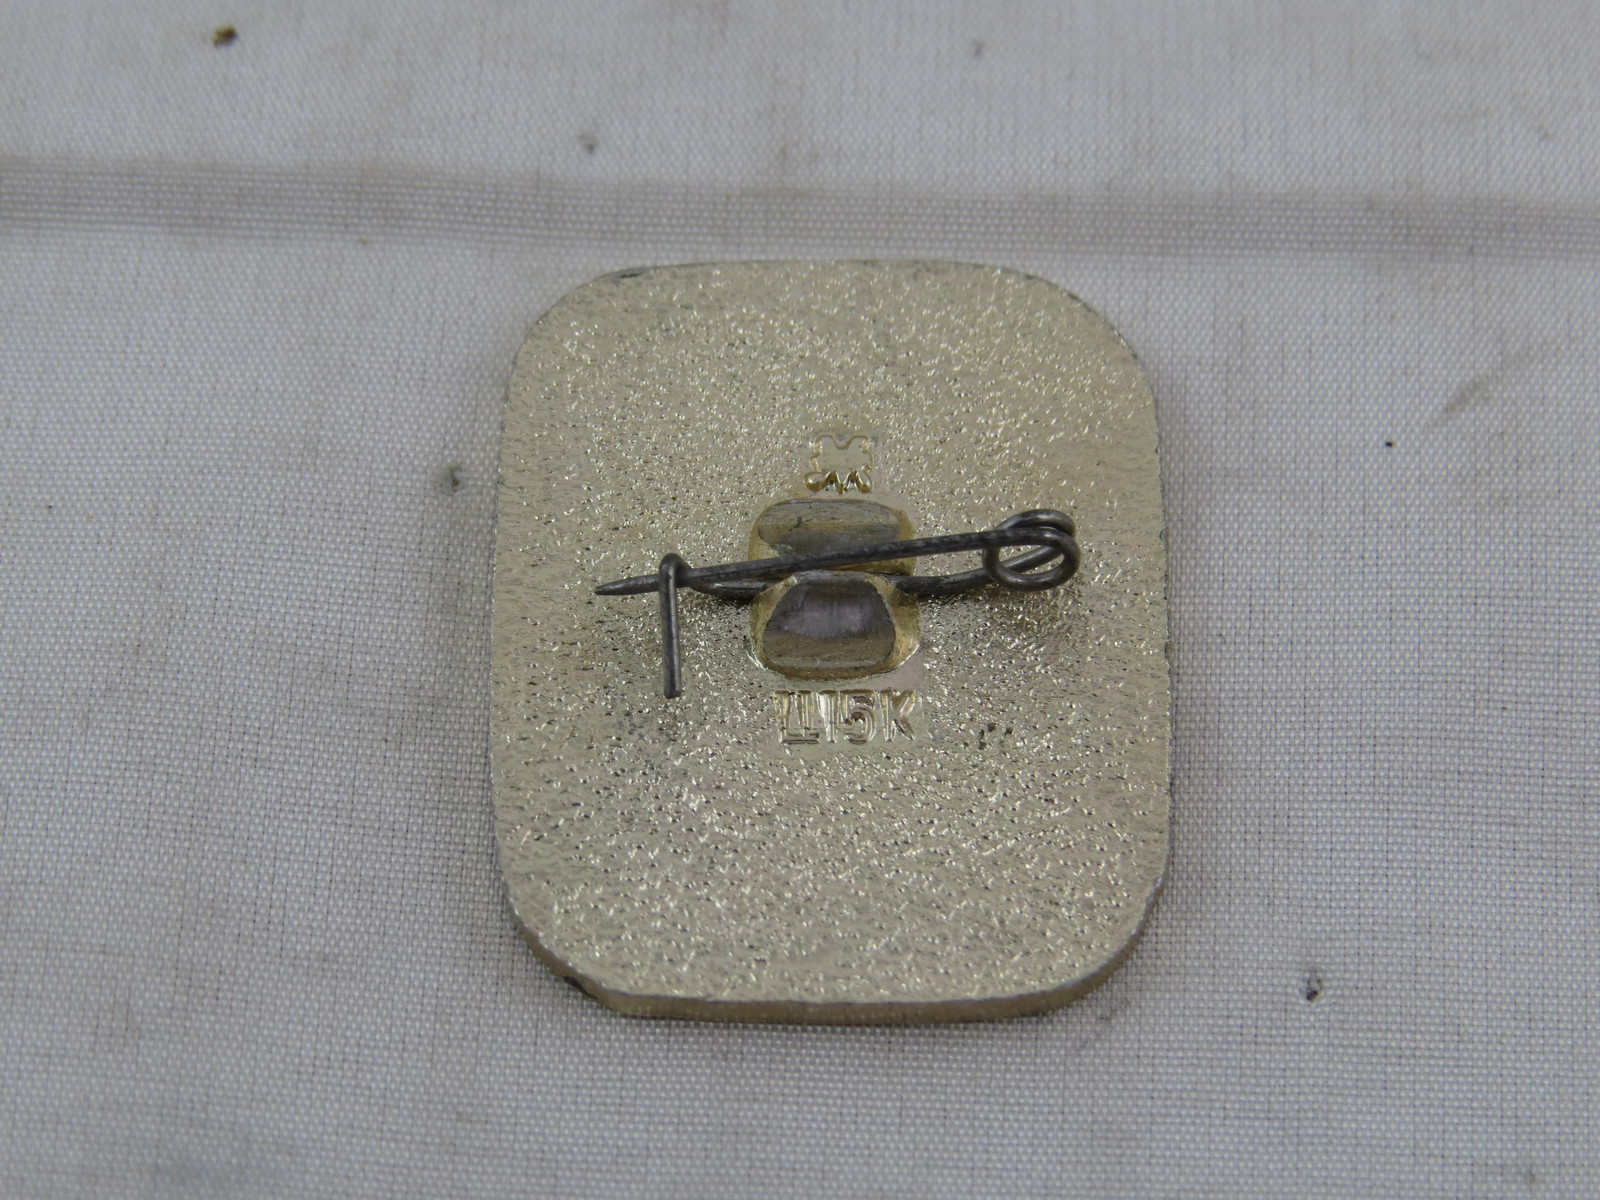 Vintage Hockey Pin - 1973 World Hockey Championships Moscow - Metal Pin